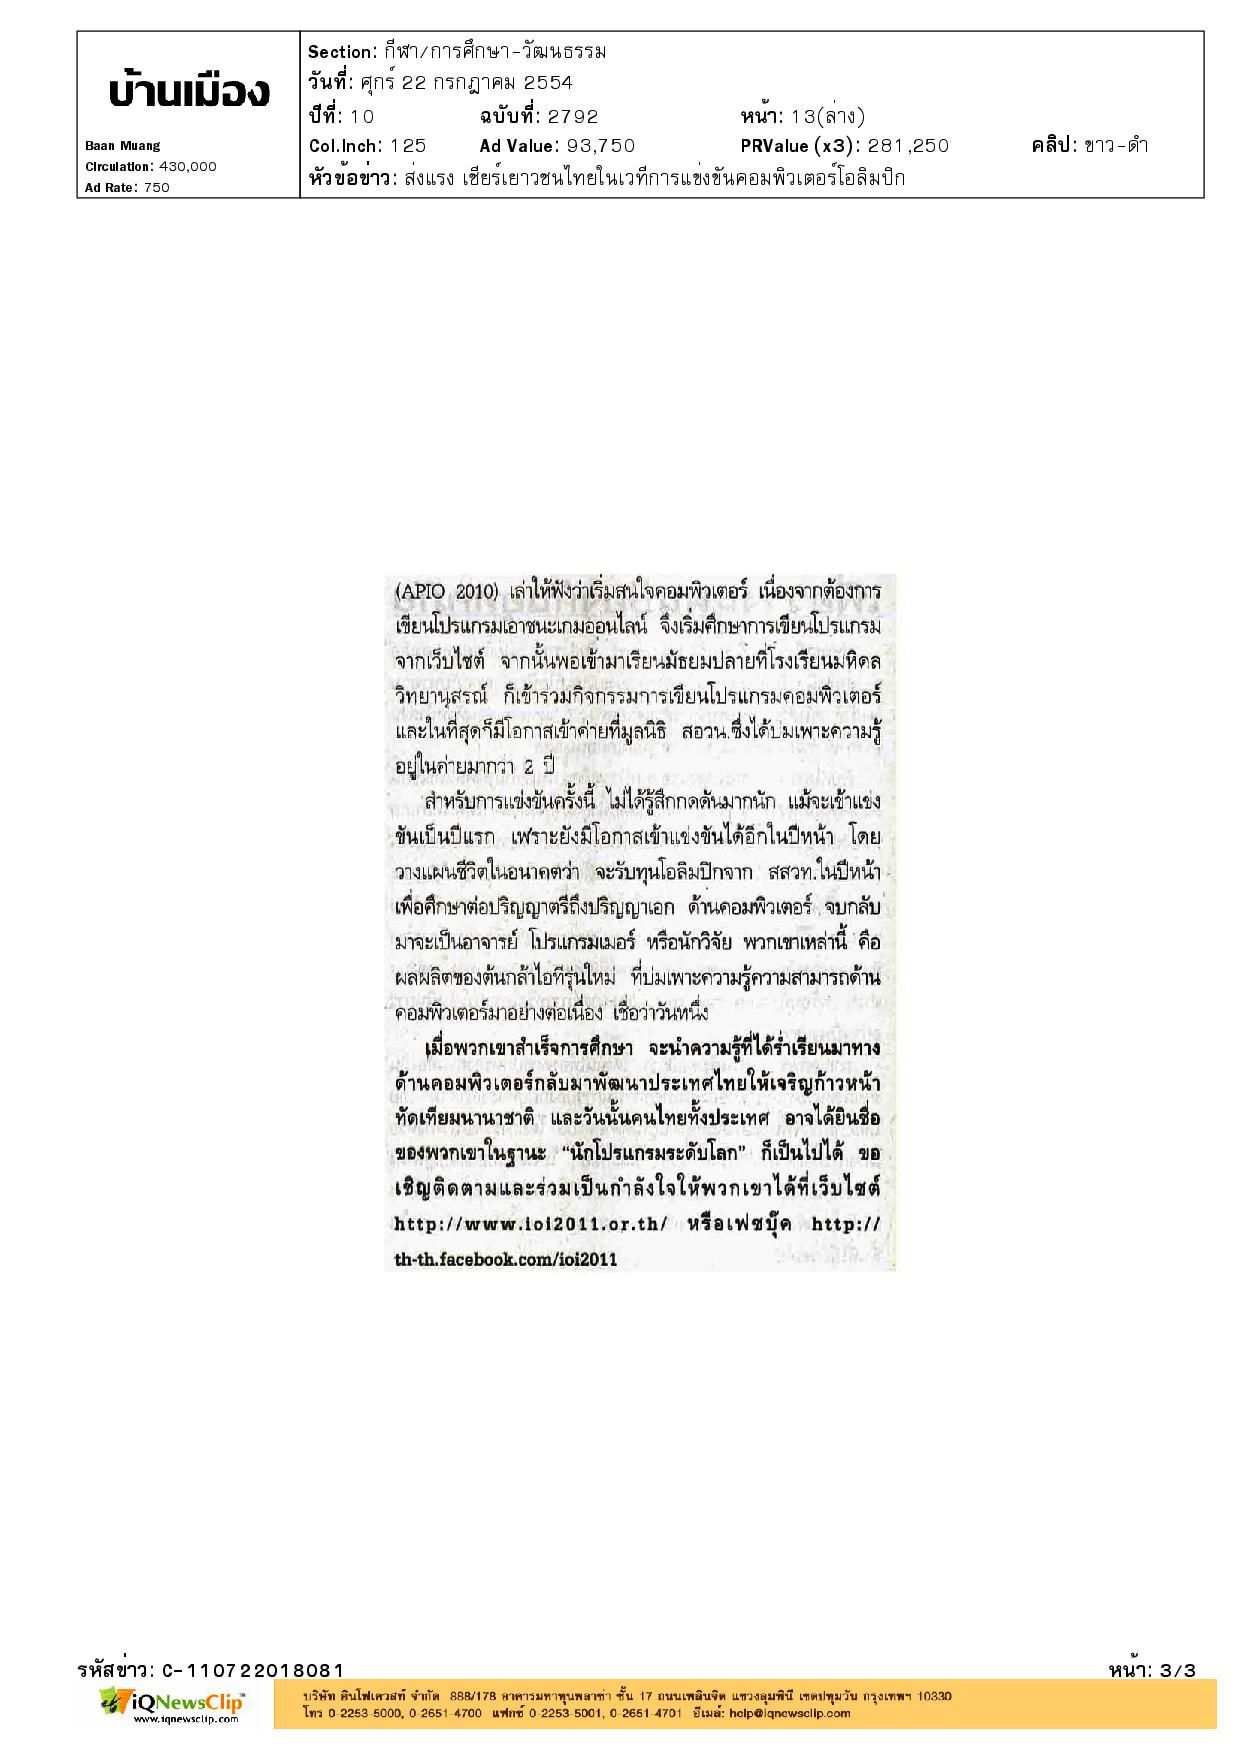 C-110722018081.pdf-2